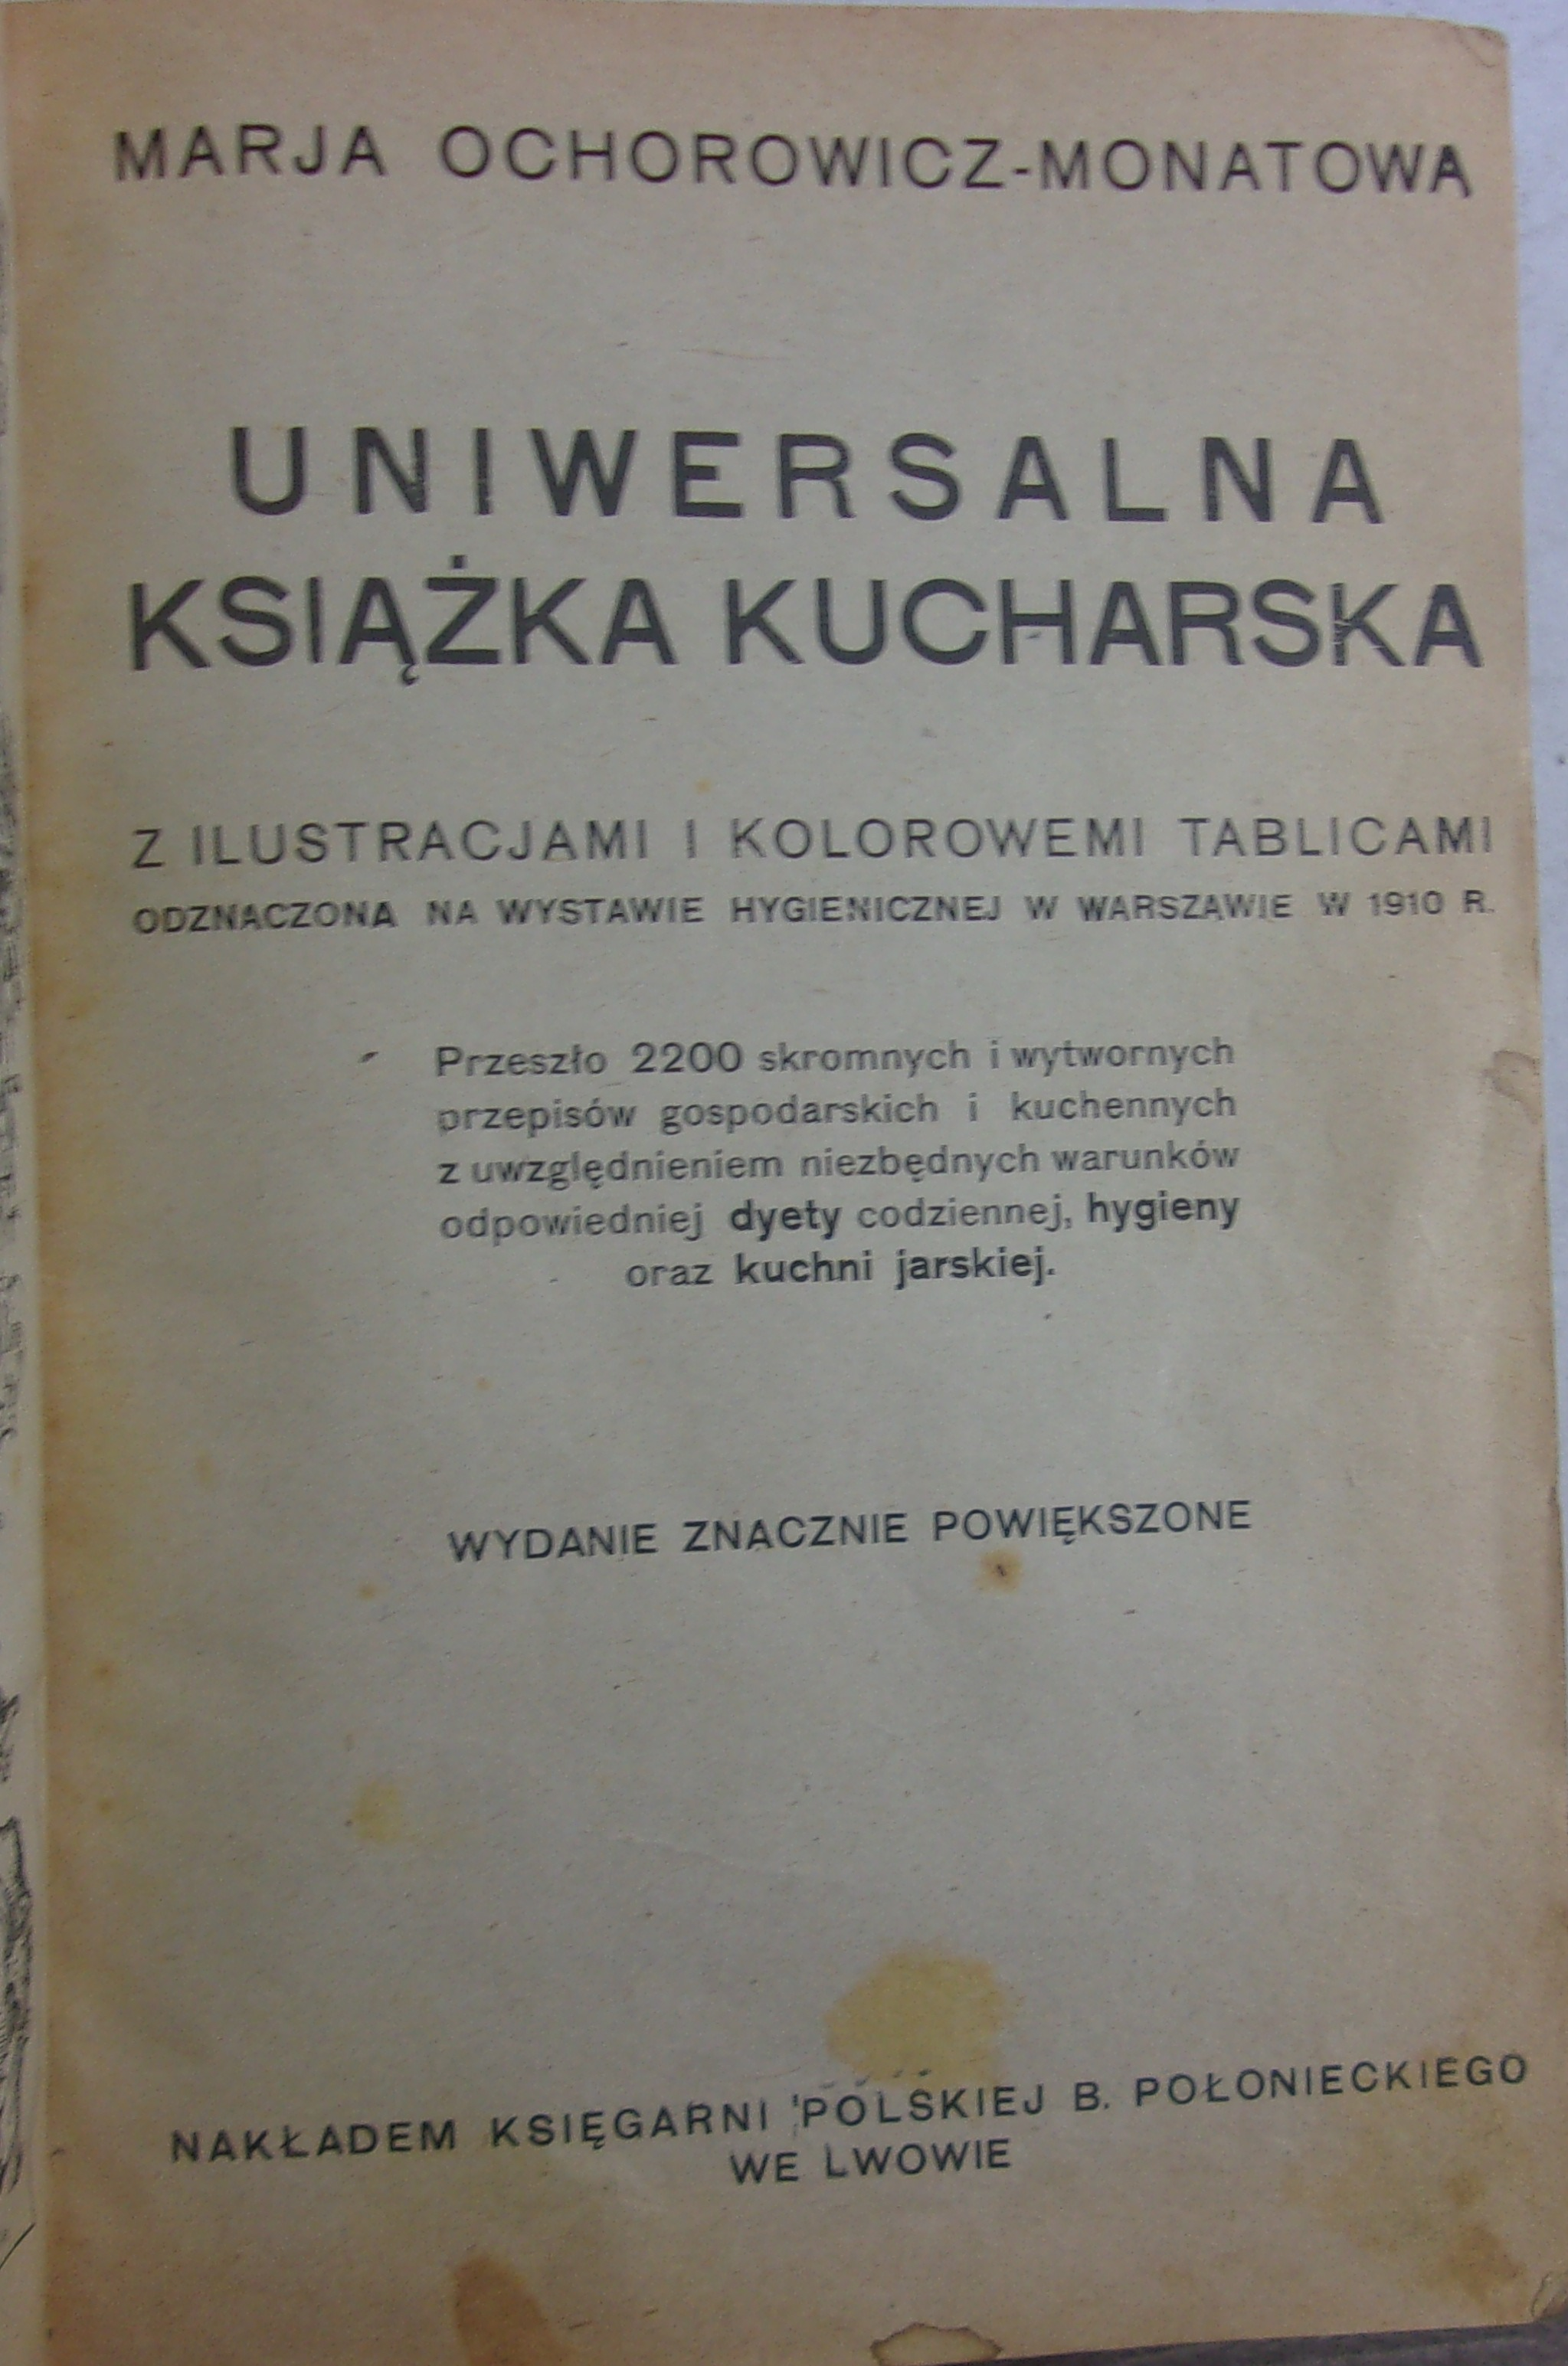 Uniwersalna Ksiazka Kucharska Marja Ochorowicz Monatowa 120 00